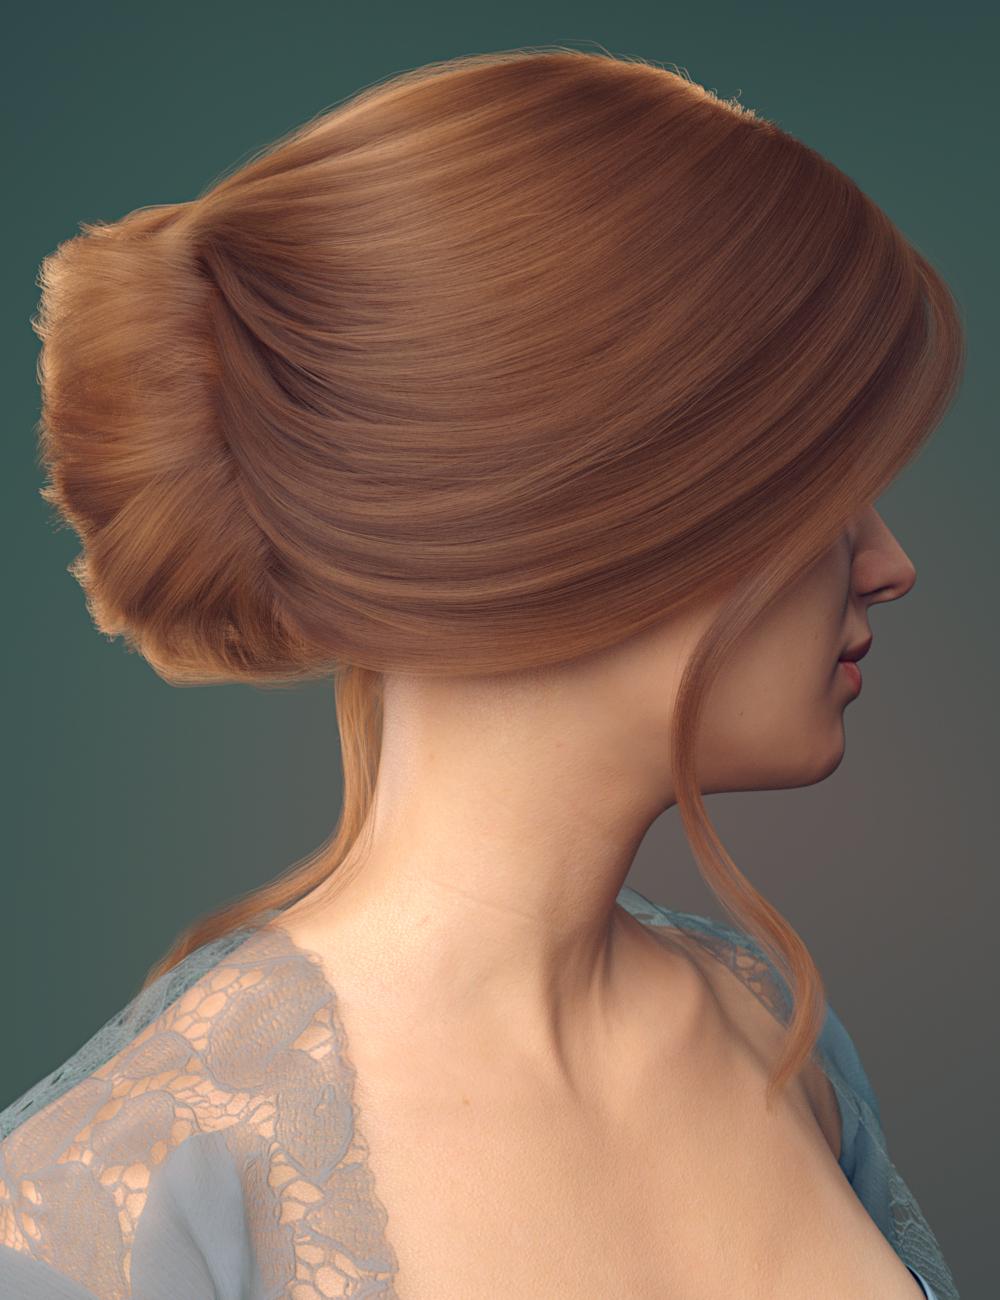 dForce French Twist Updo for Genesis 8 Females by: Toyen, 3D Models by Daz 3D